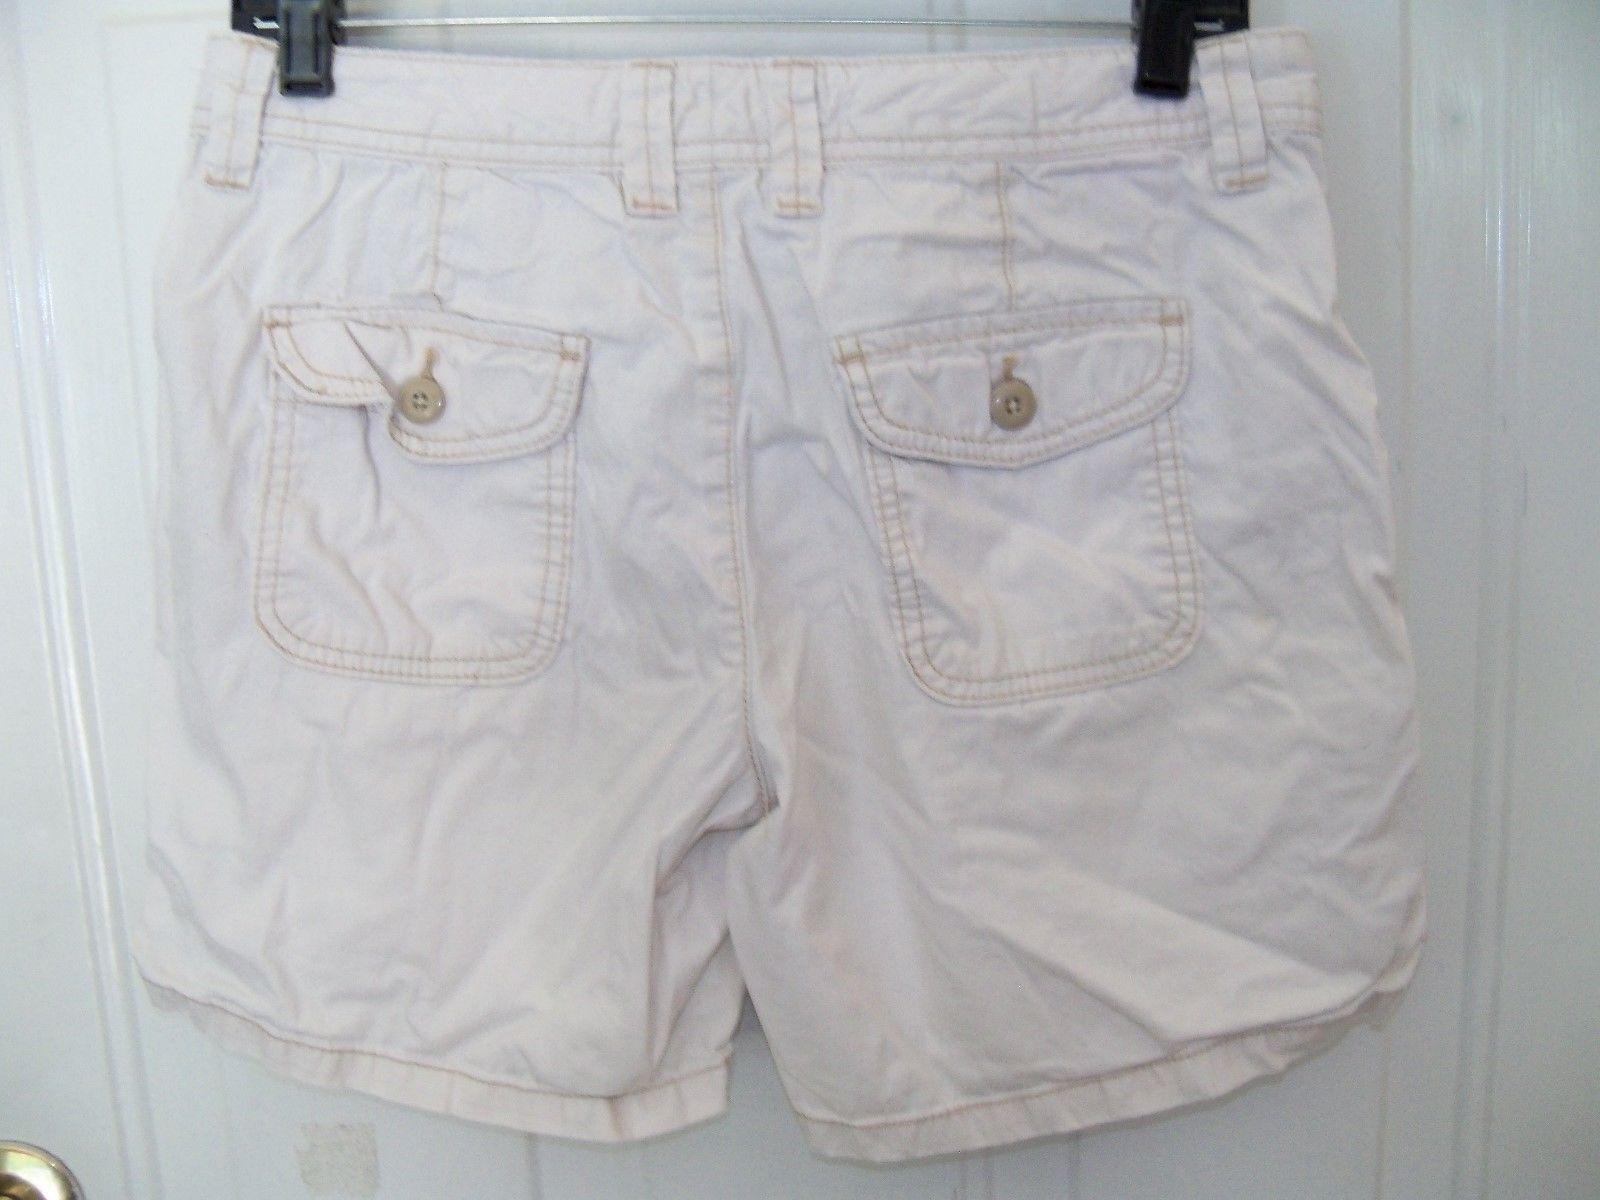 RALPH LAUREN POLO JEANS Light Tan Shorts Size 2 Women's EUC